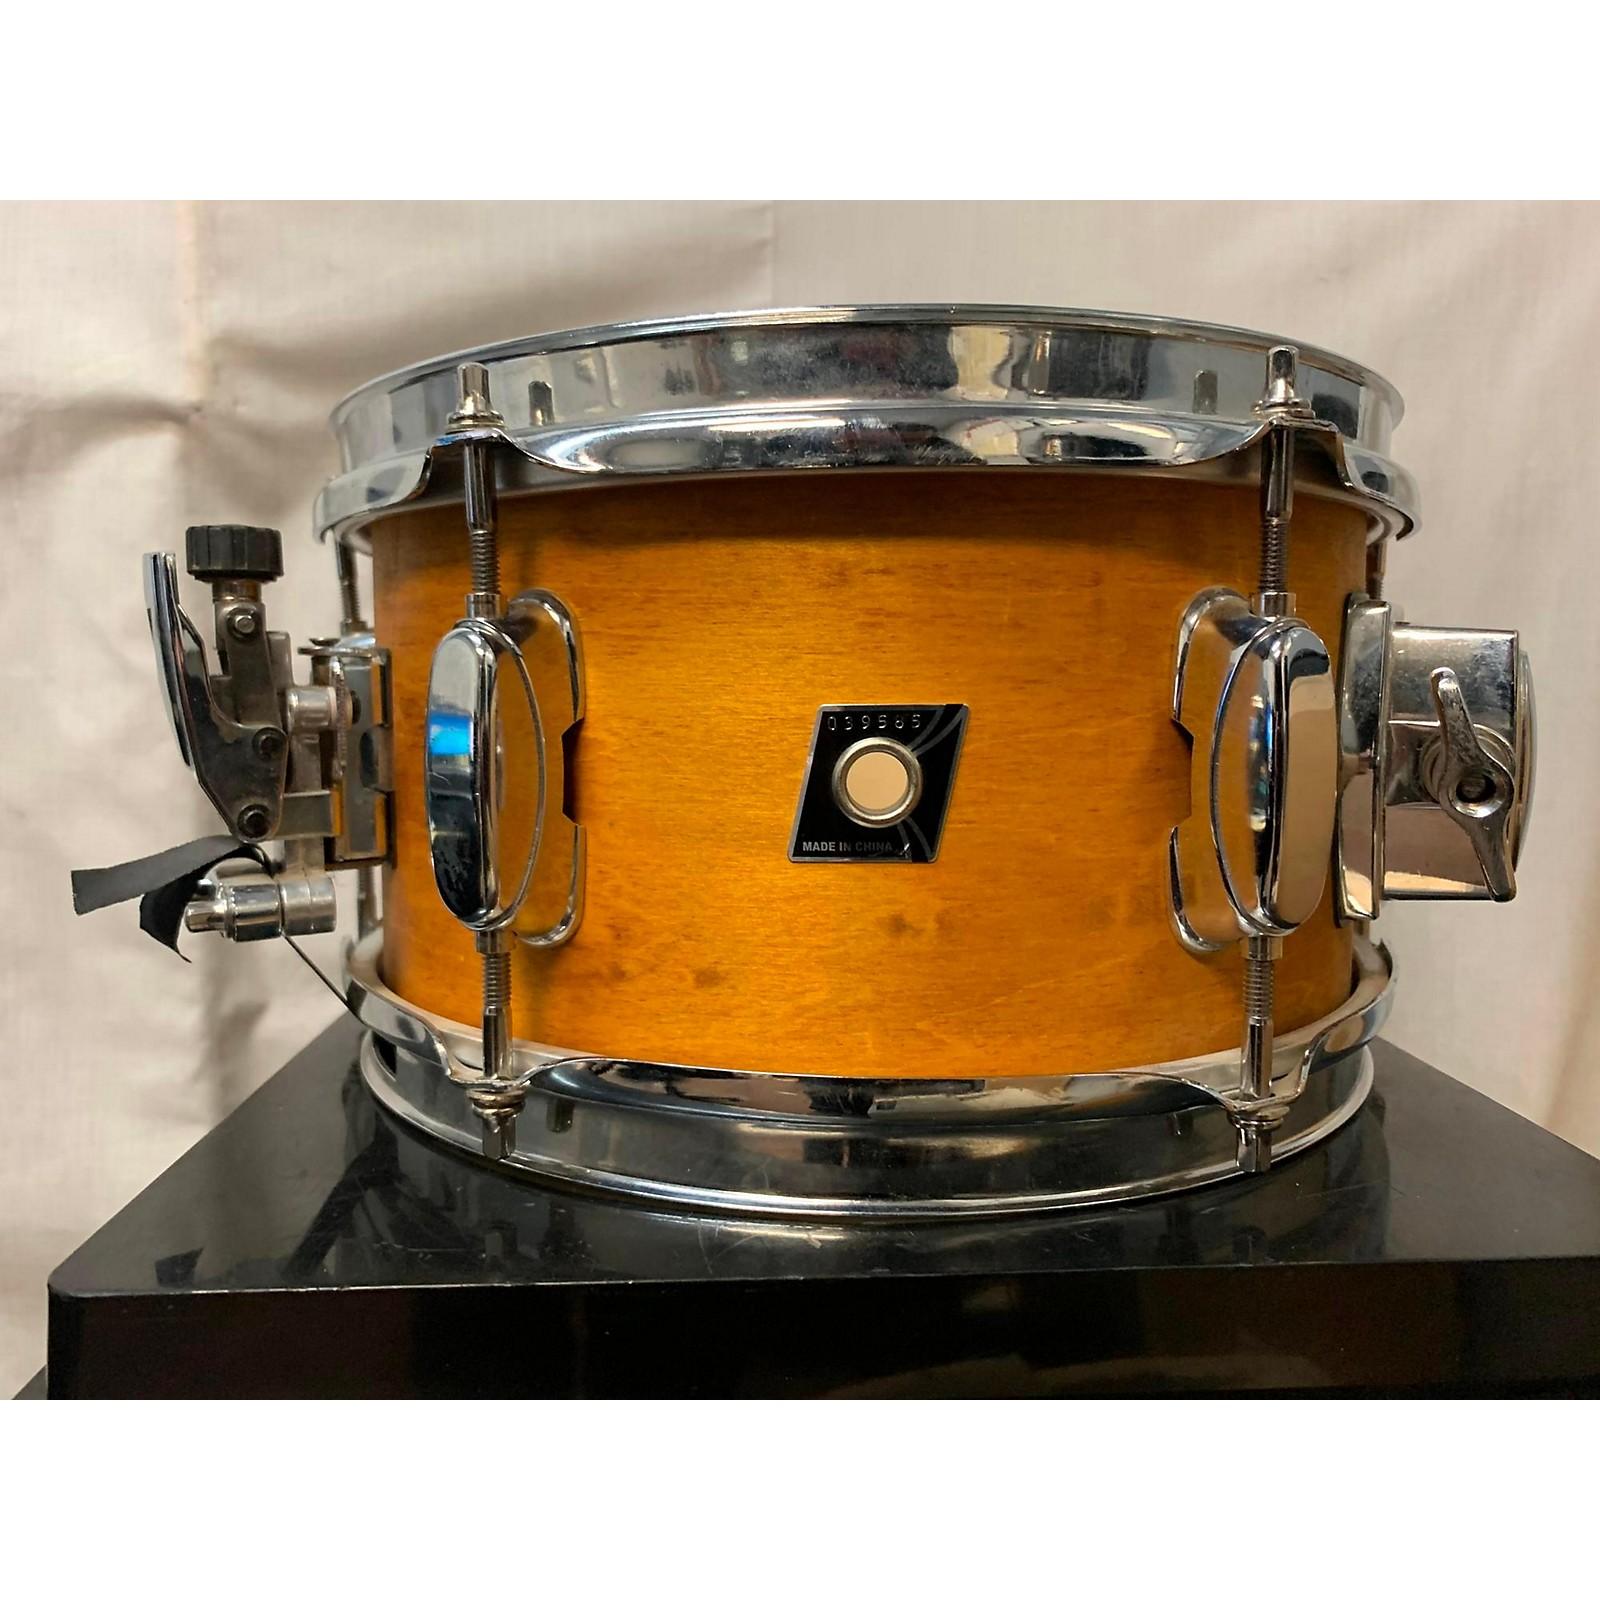 TAMA 2010s 6X10 Silverstar Snare Drum